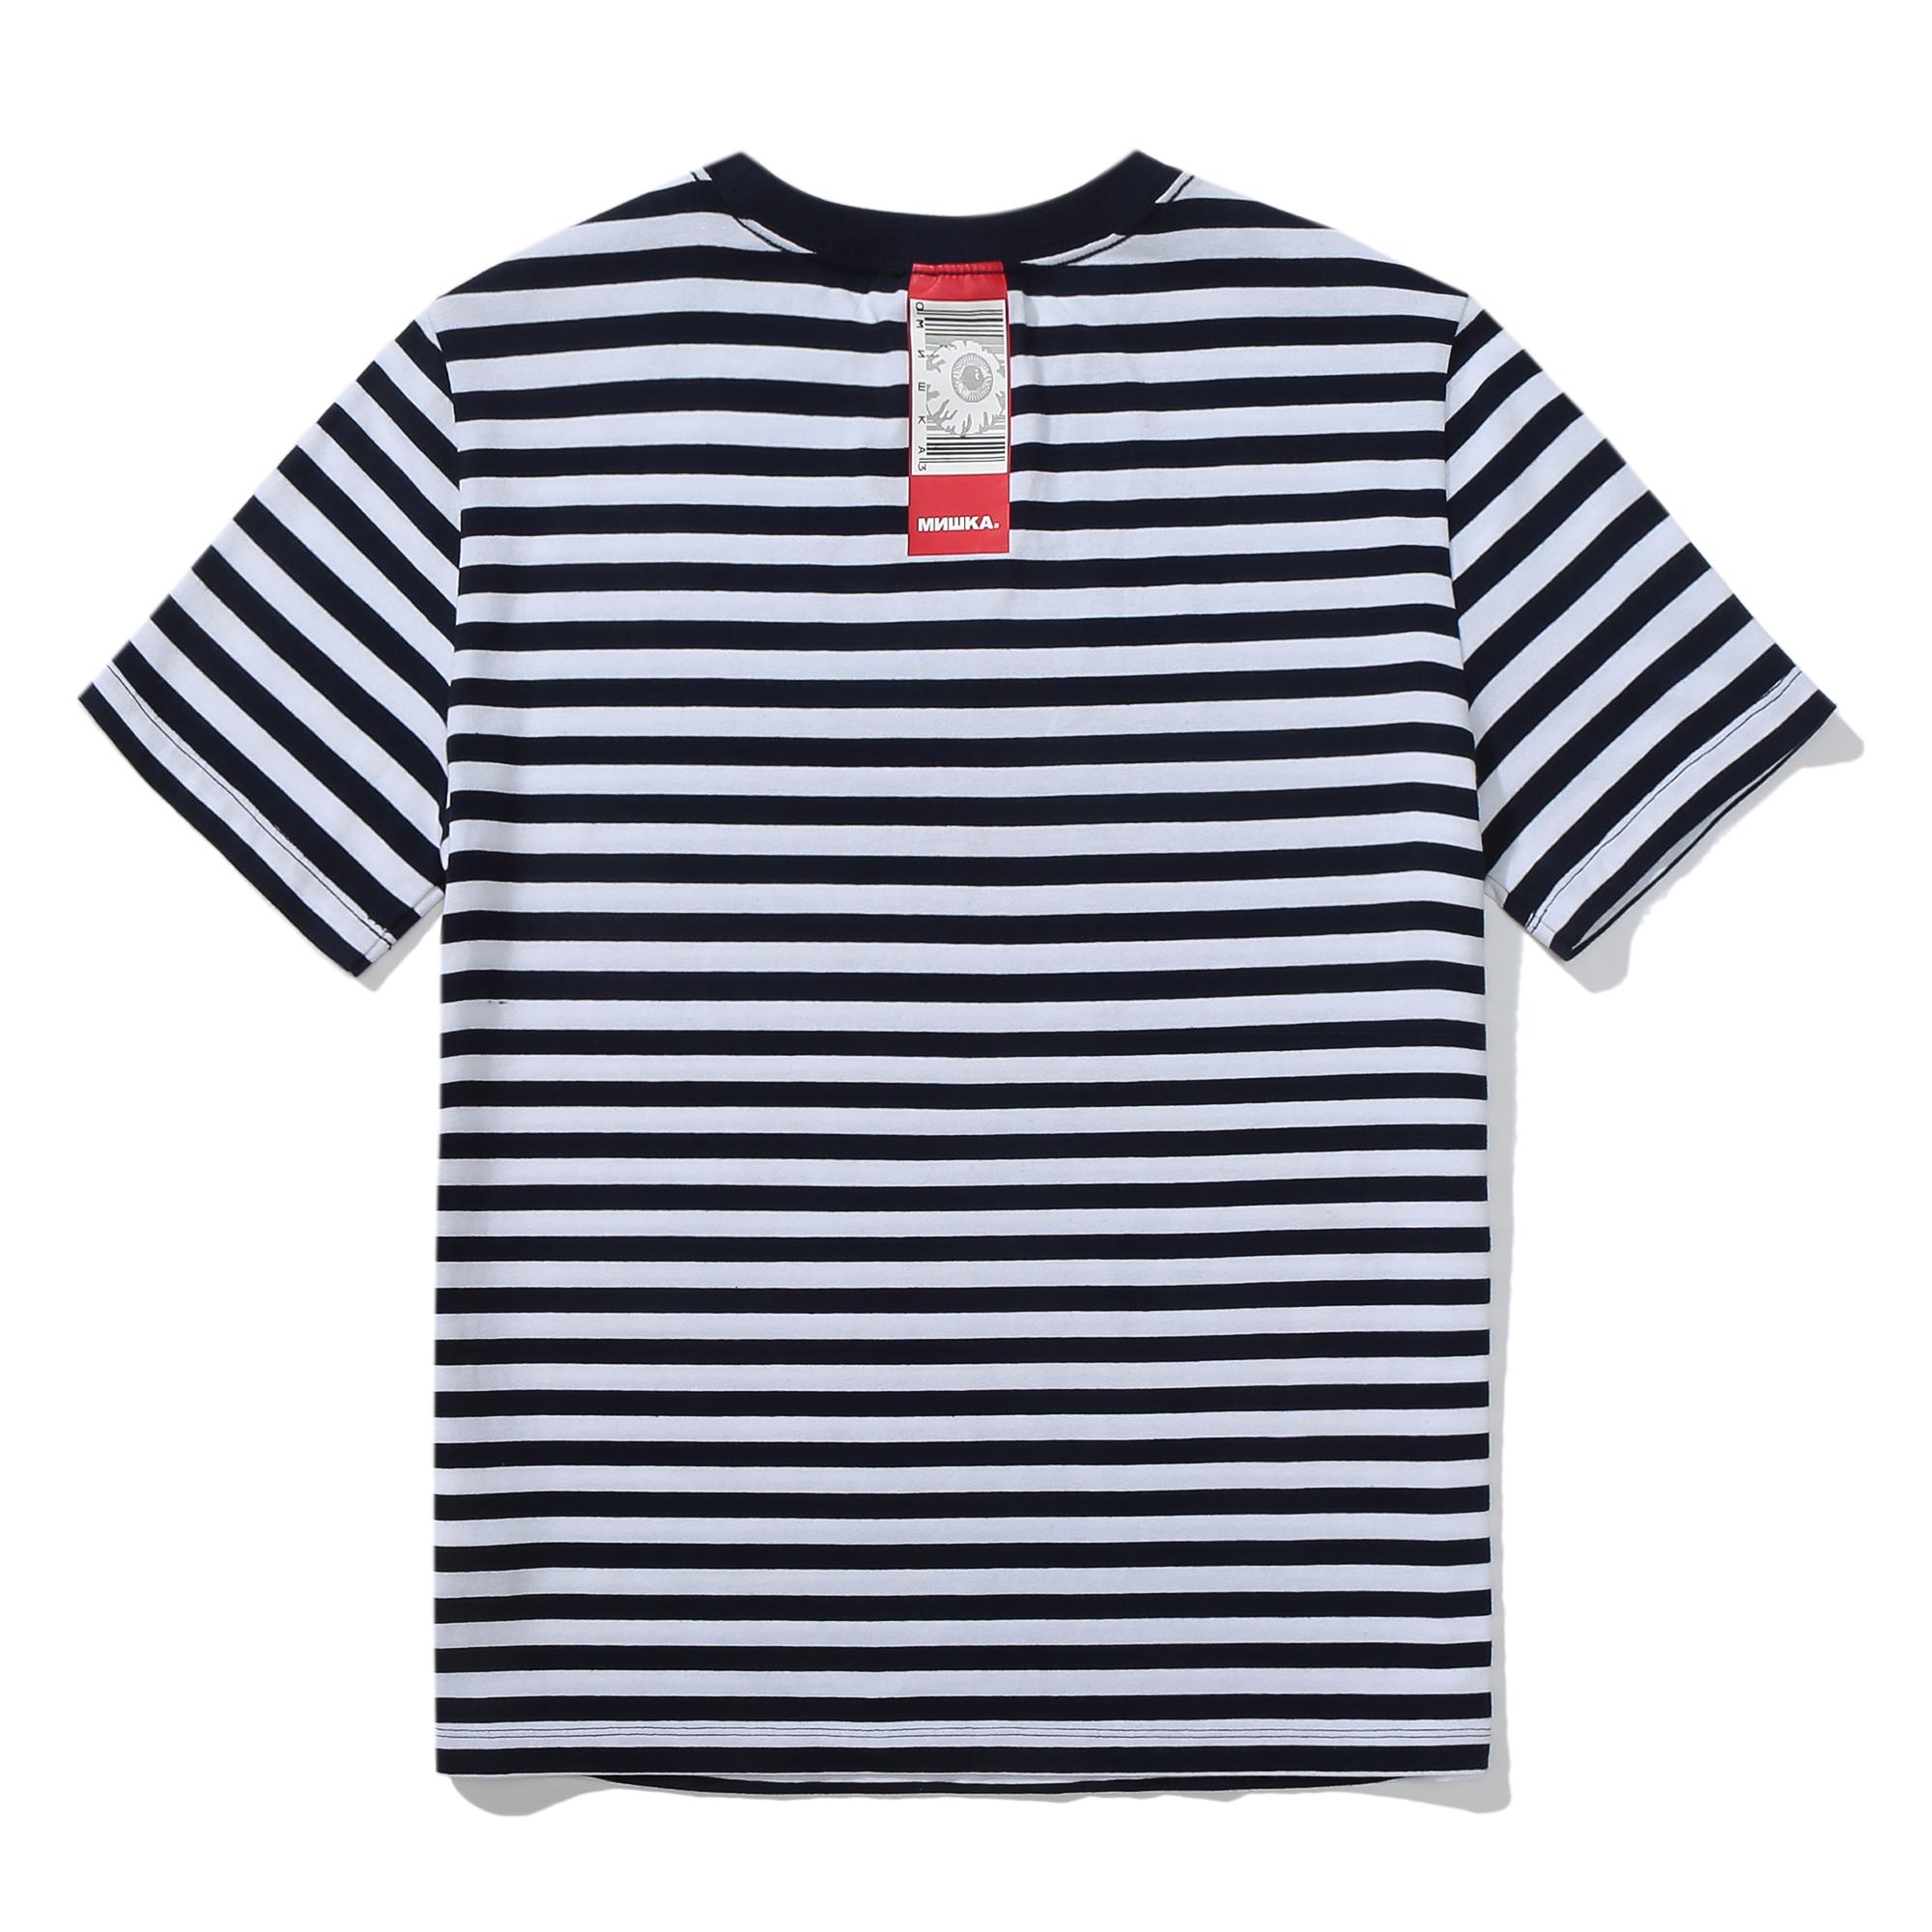 Keep Watch Navy & White Striped Womens Tee